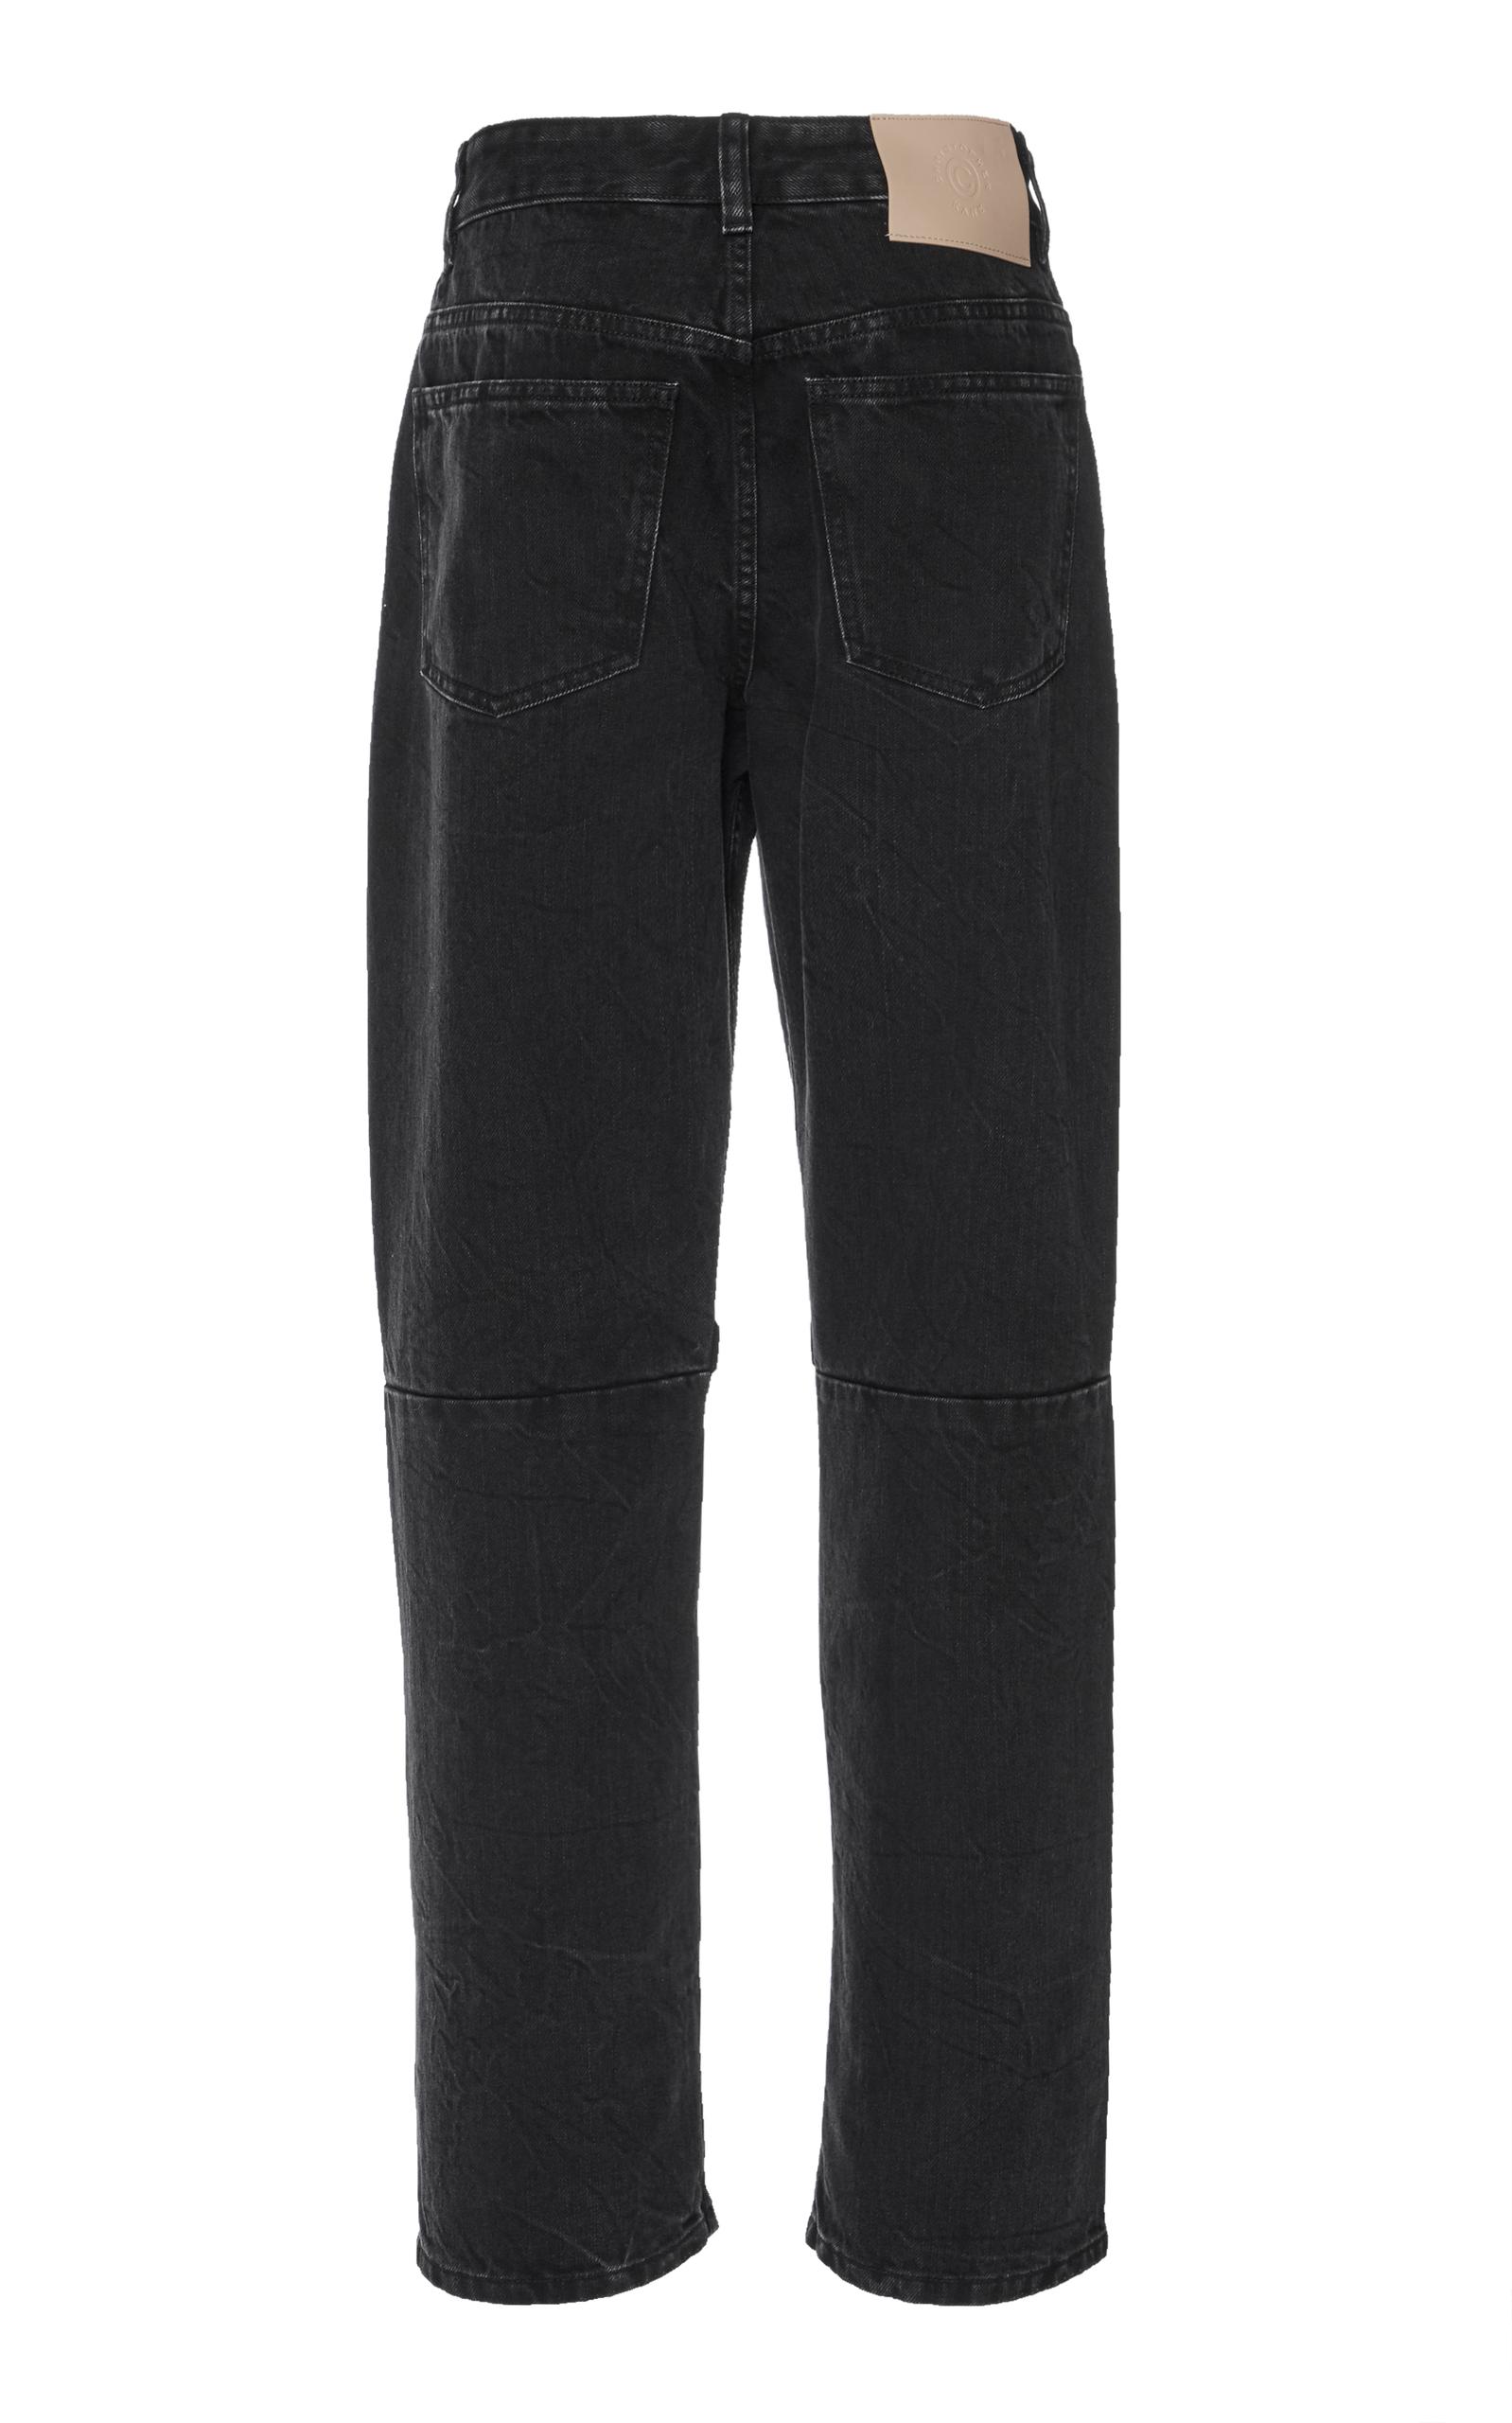 Boyfriend velcro jeans - Black Christopher Kane 3Anma6N